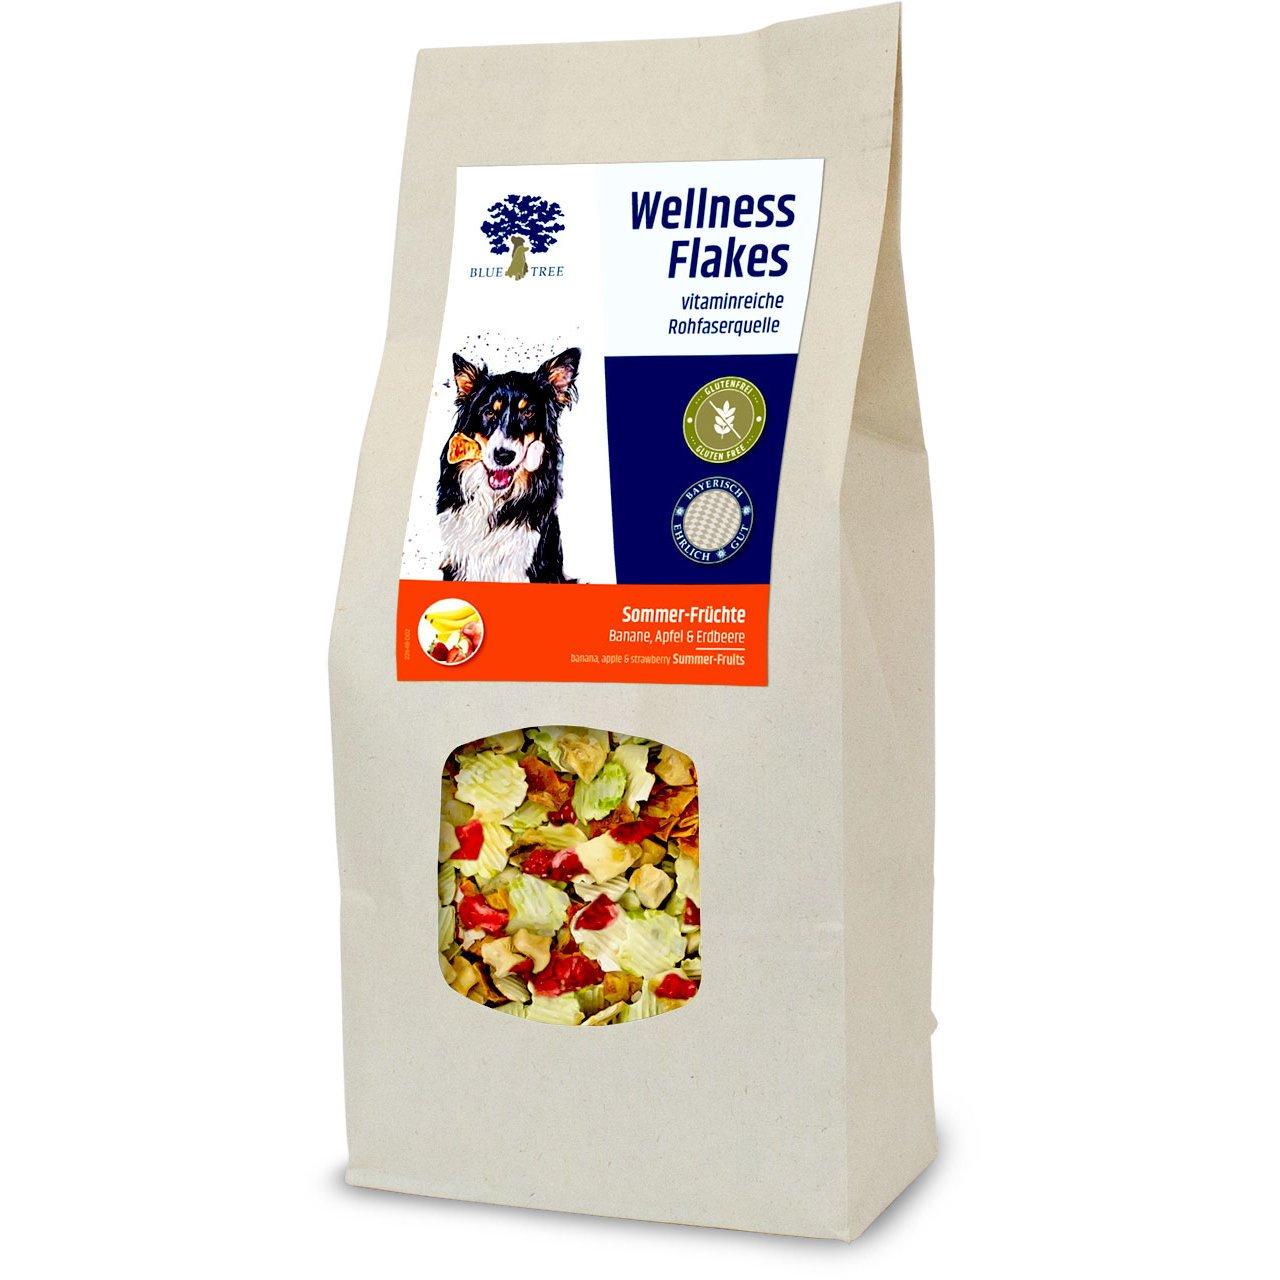 Blue Tree Wellness Flakes für Hunde, Bild 6